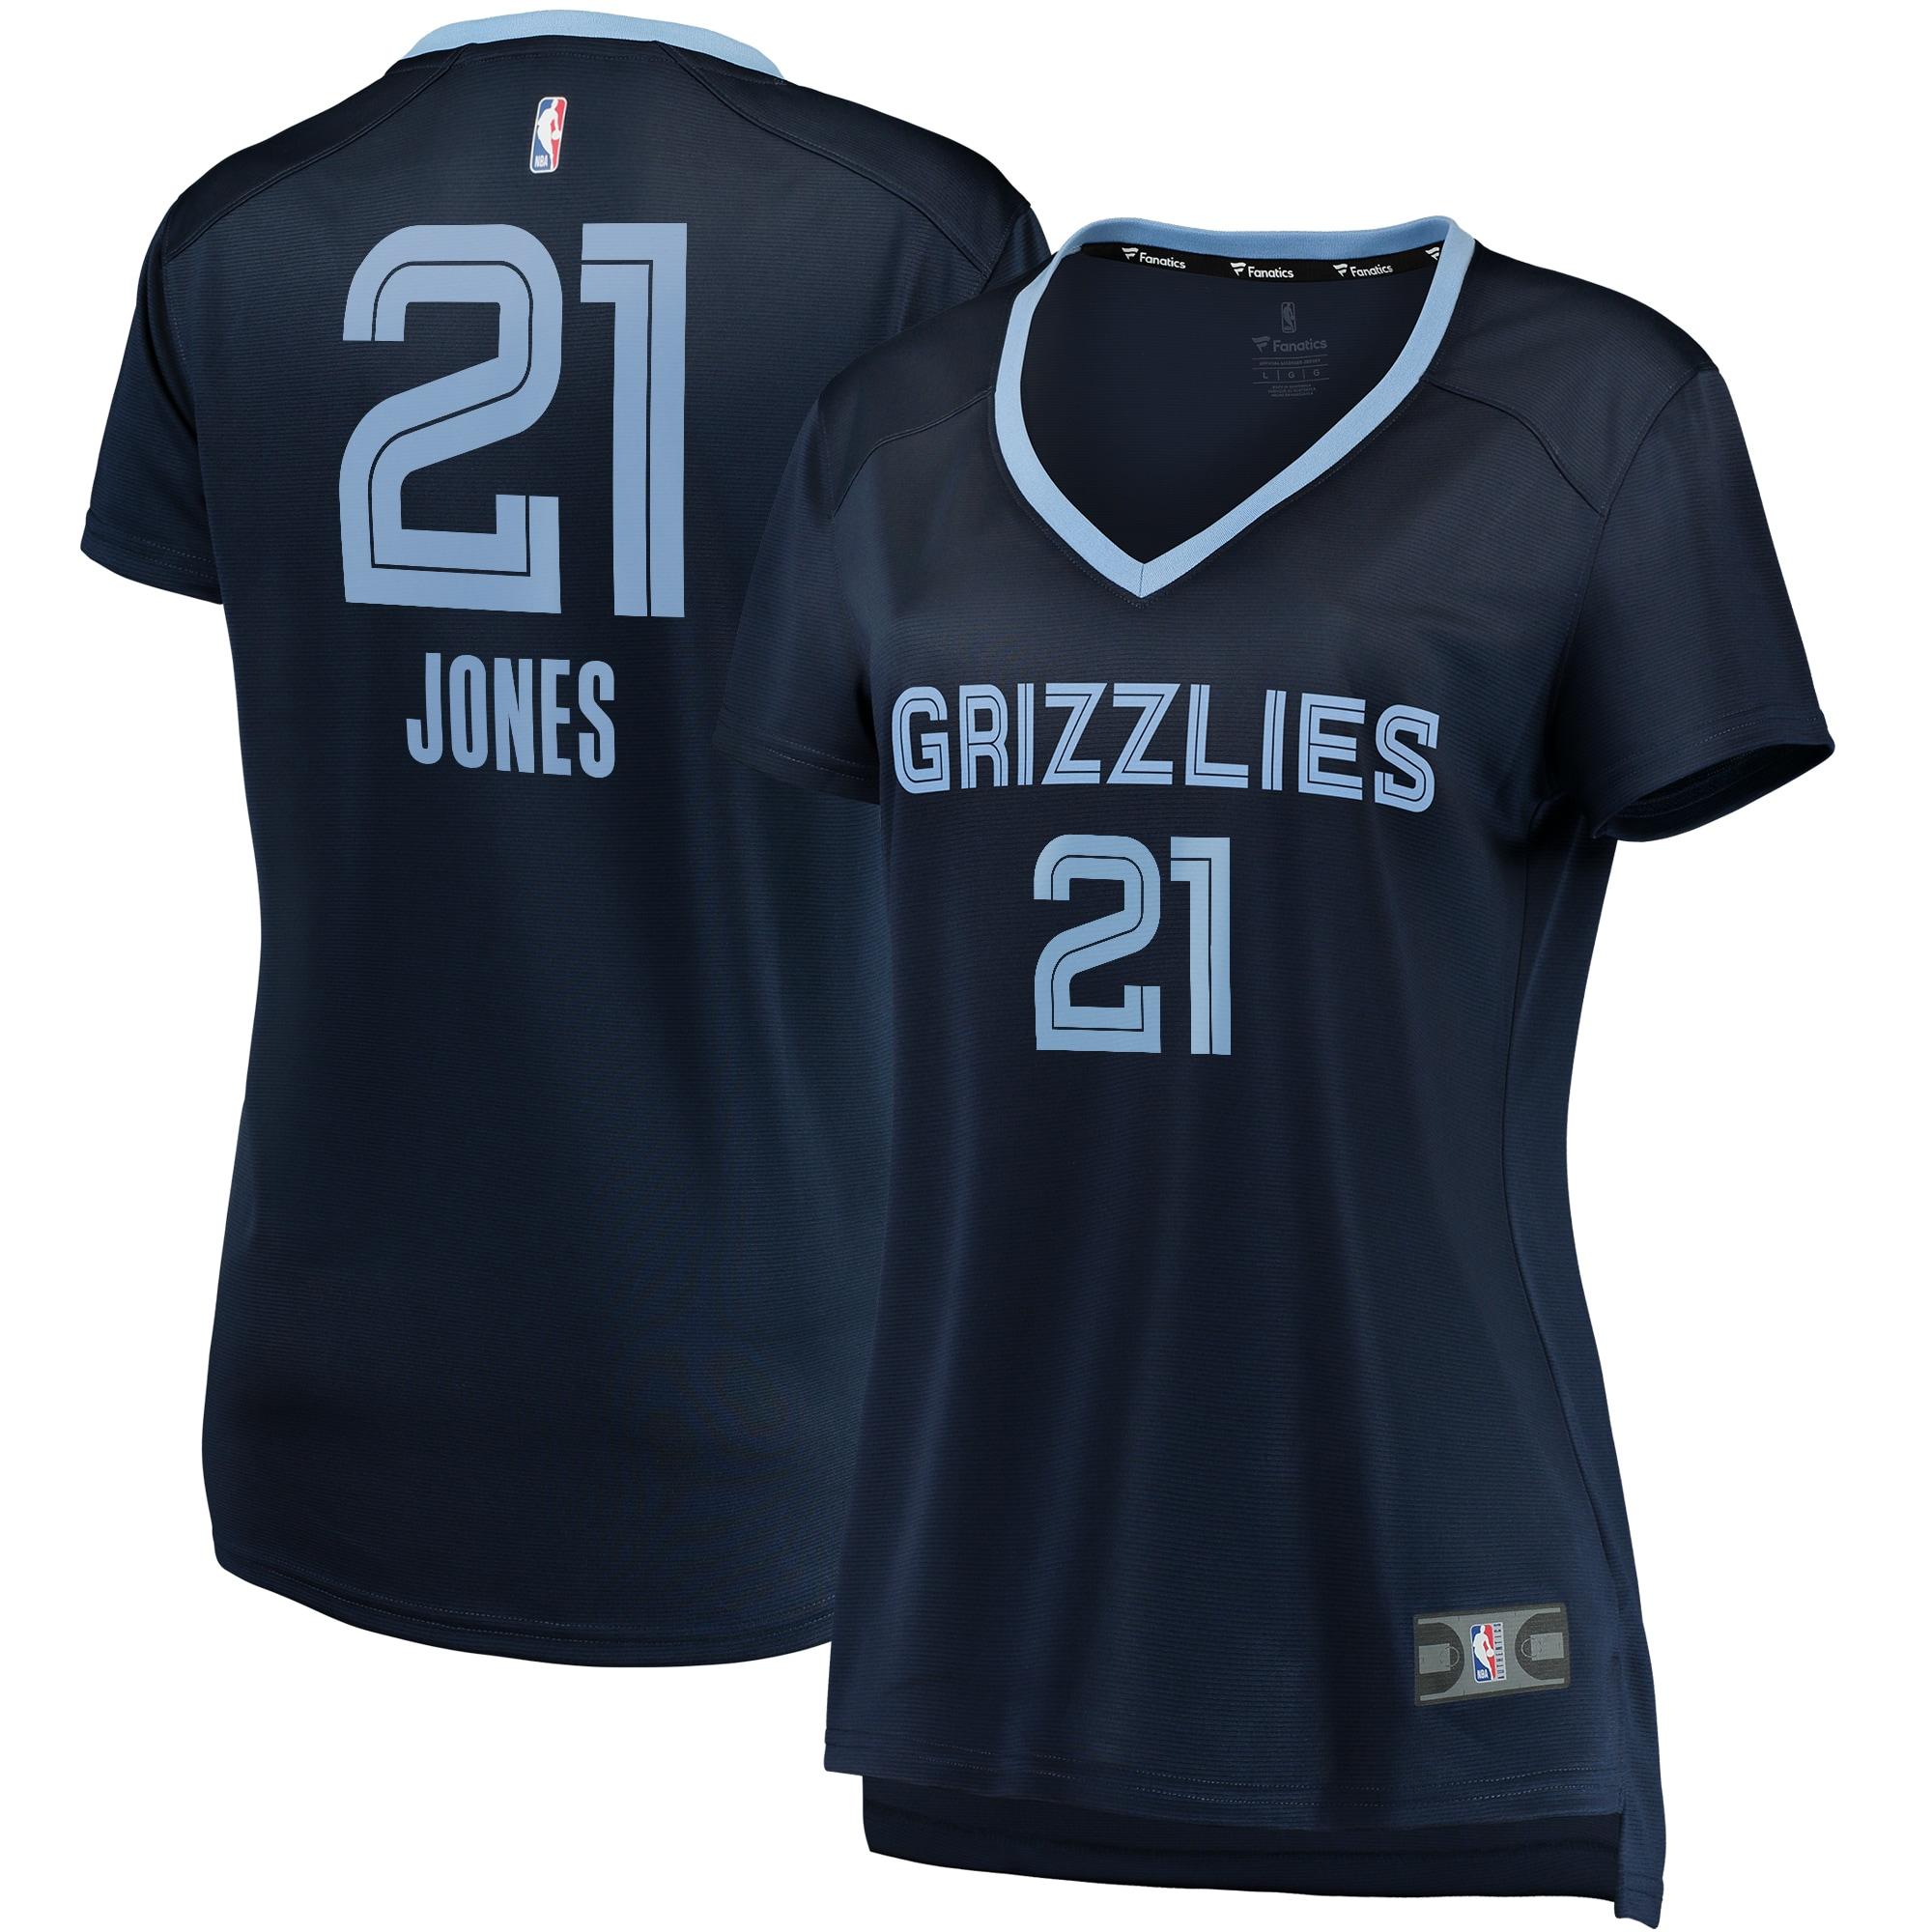 Tyus Jones Memphis Grizzlies Fanatics Branded Women's Fast Break Player Jersey - Icon Edition - Navy